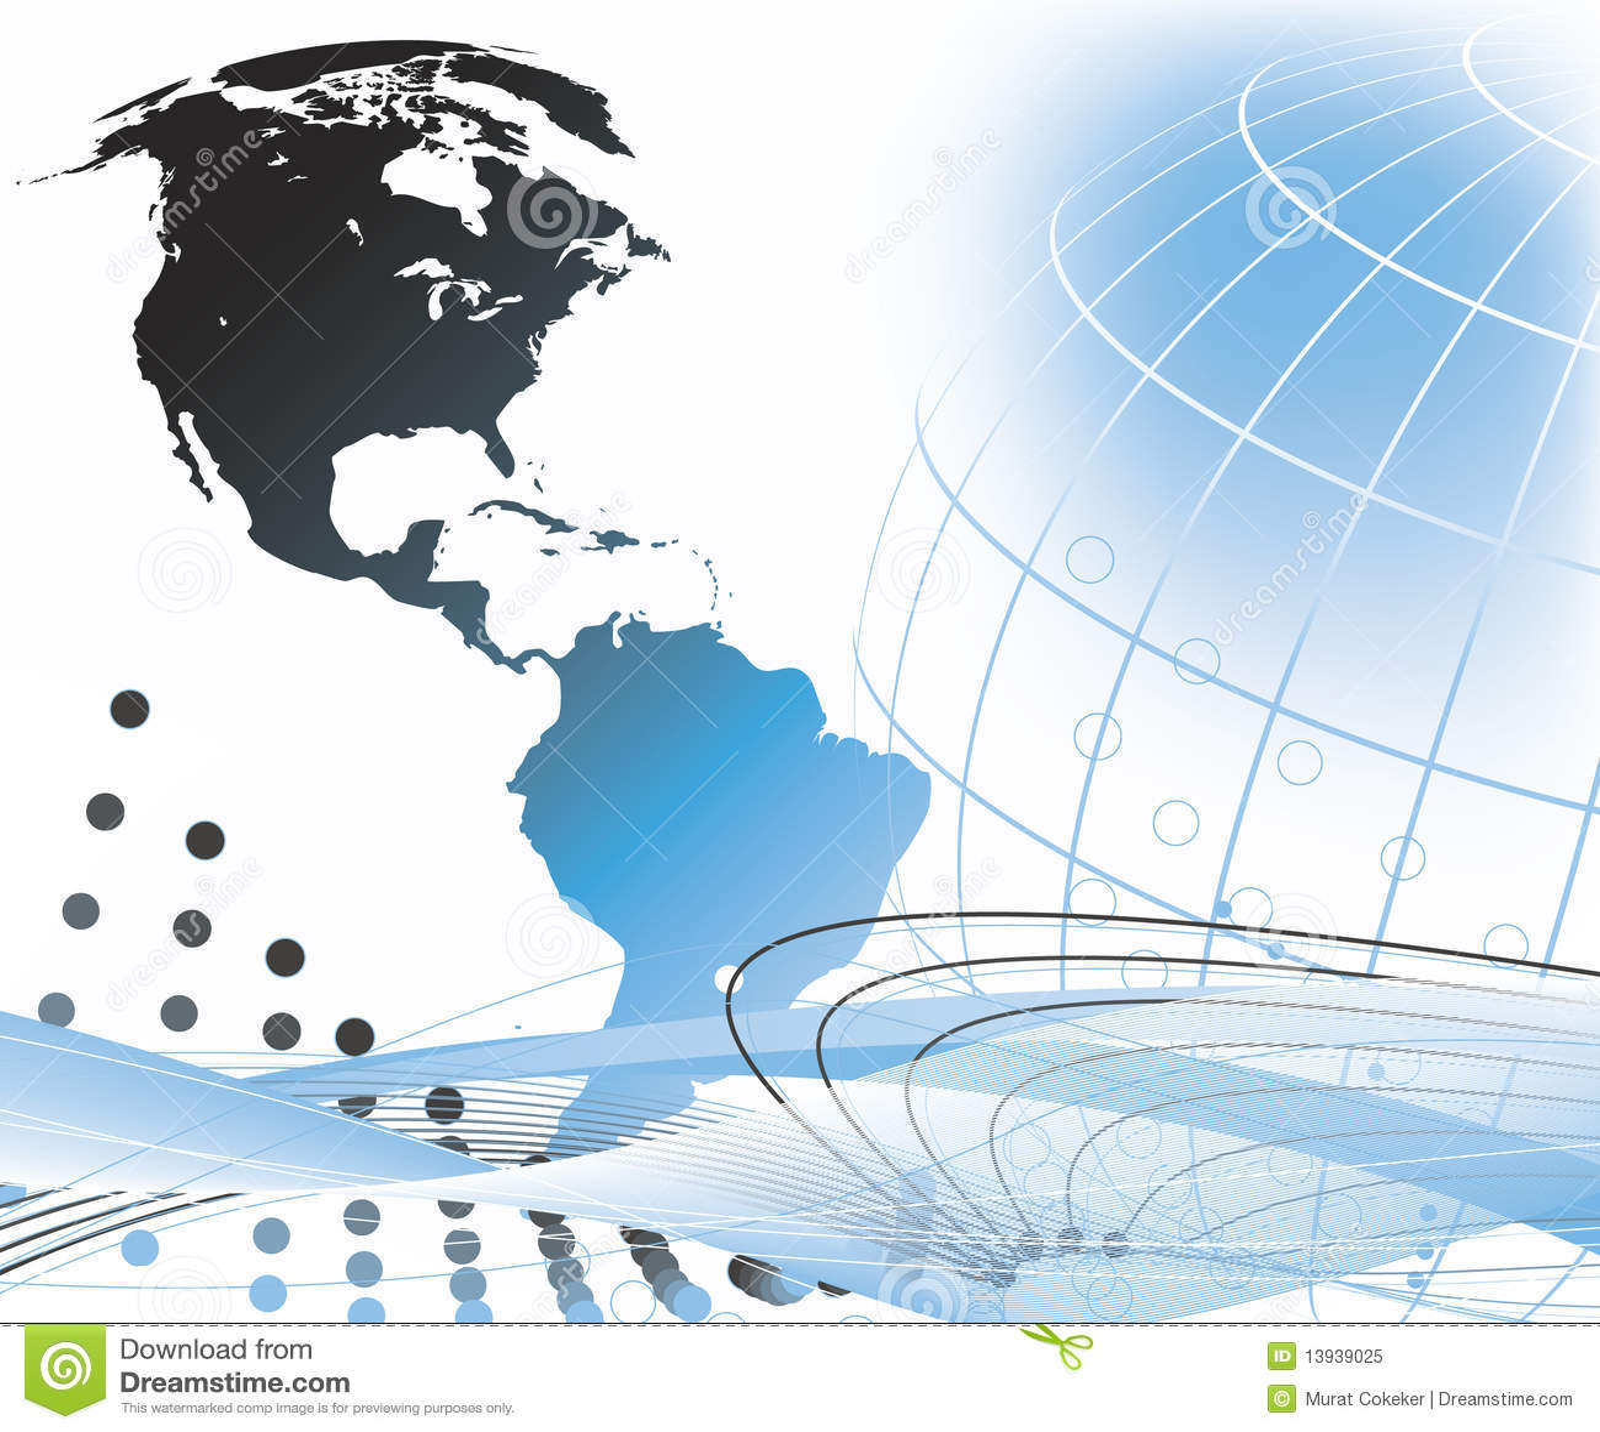 hight resolution of abstract world globe design